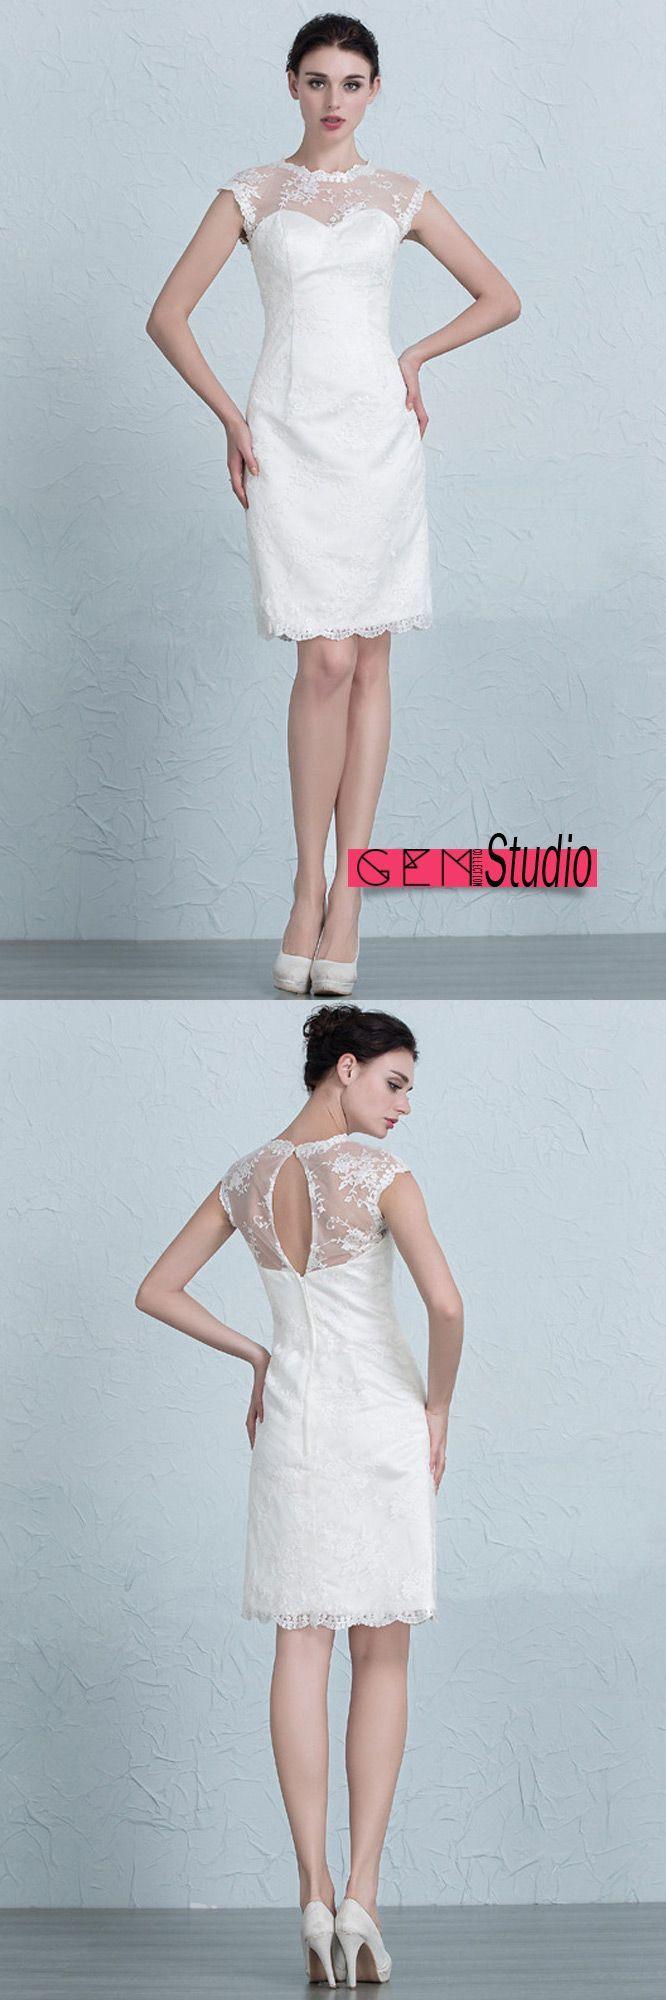 Elegant short wedding dresses  Elegant Tight Short Wedding Dresses Reception Modest Lace Style